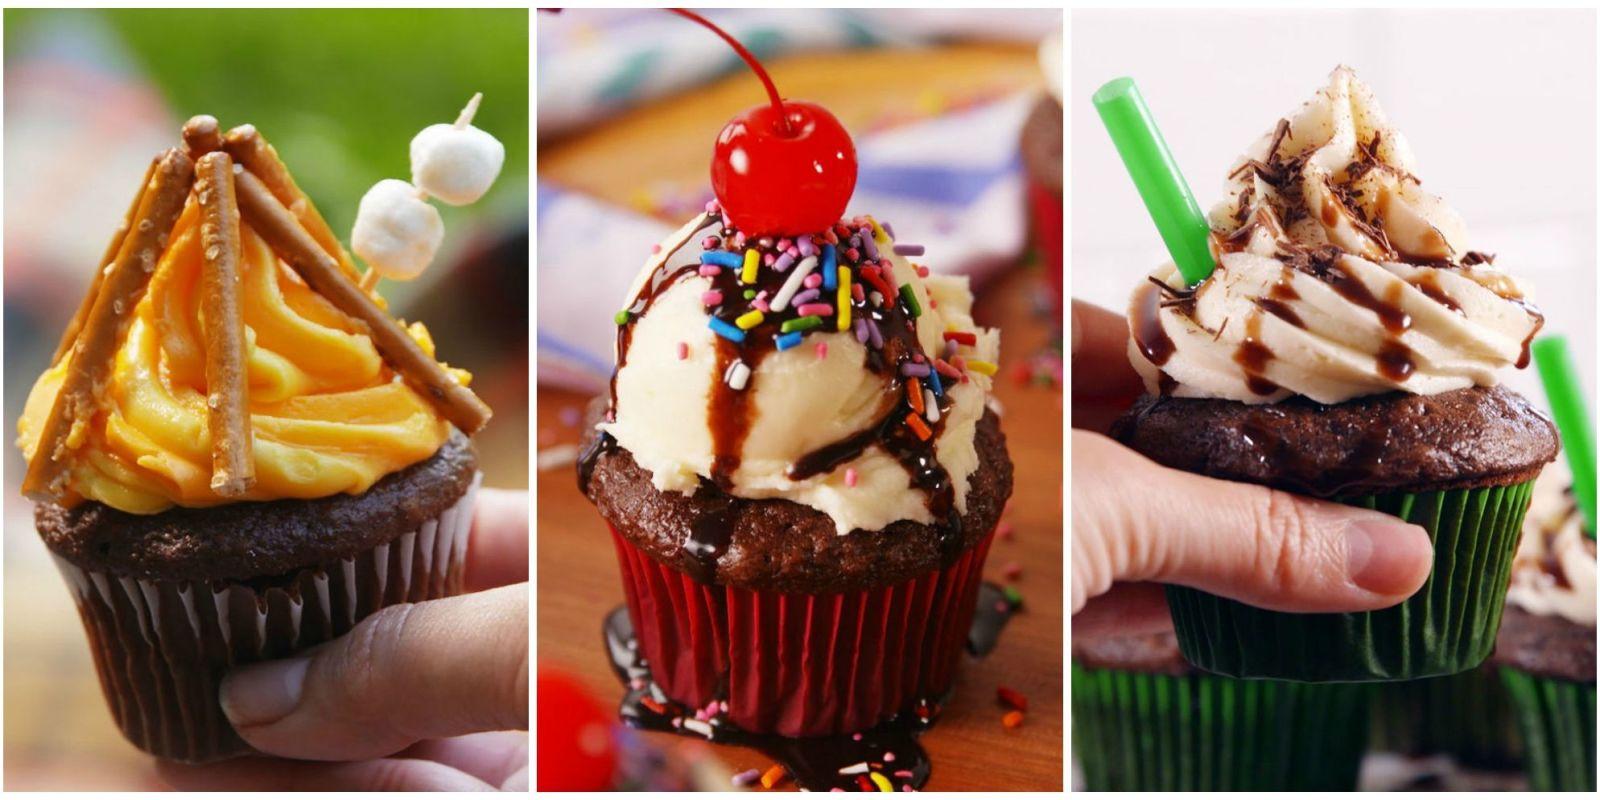 10 easy cupcake recipes for kids cute cupcake decorating ideas for kids - Creme decoration cupcake ...